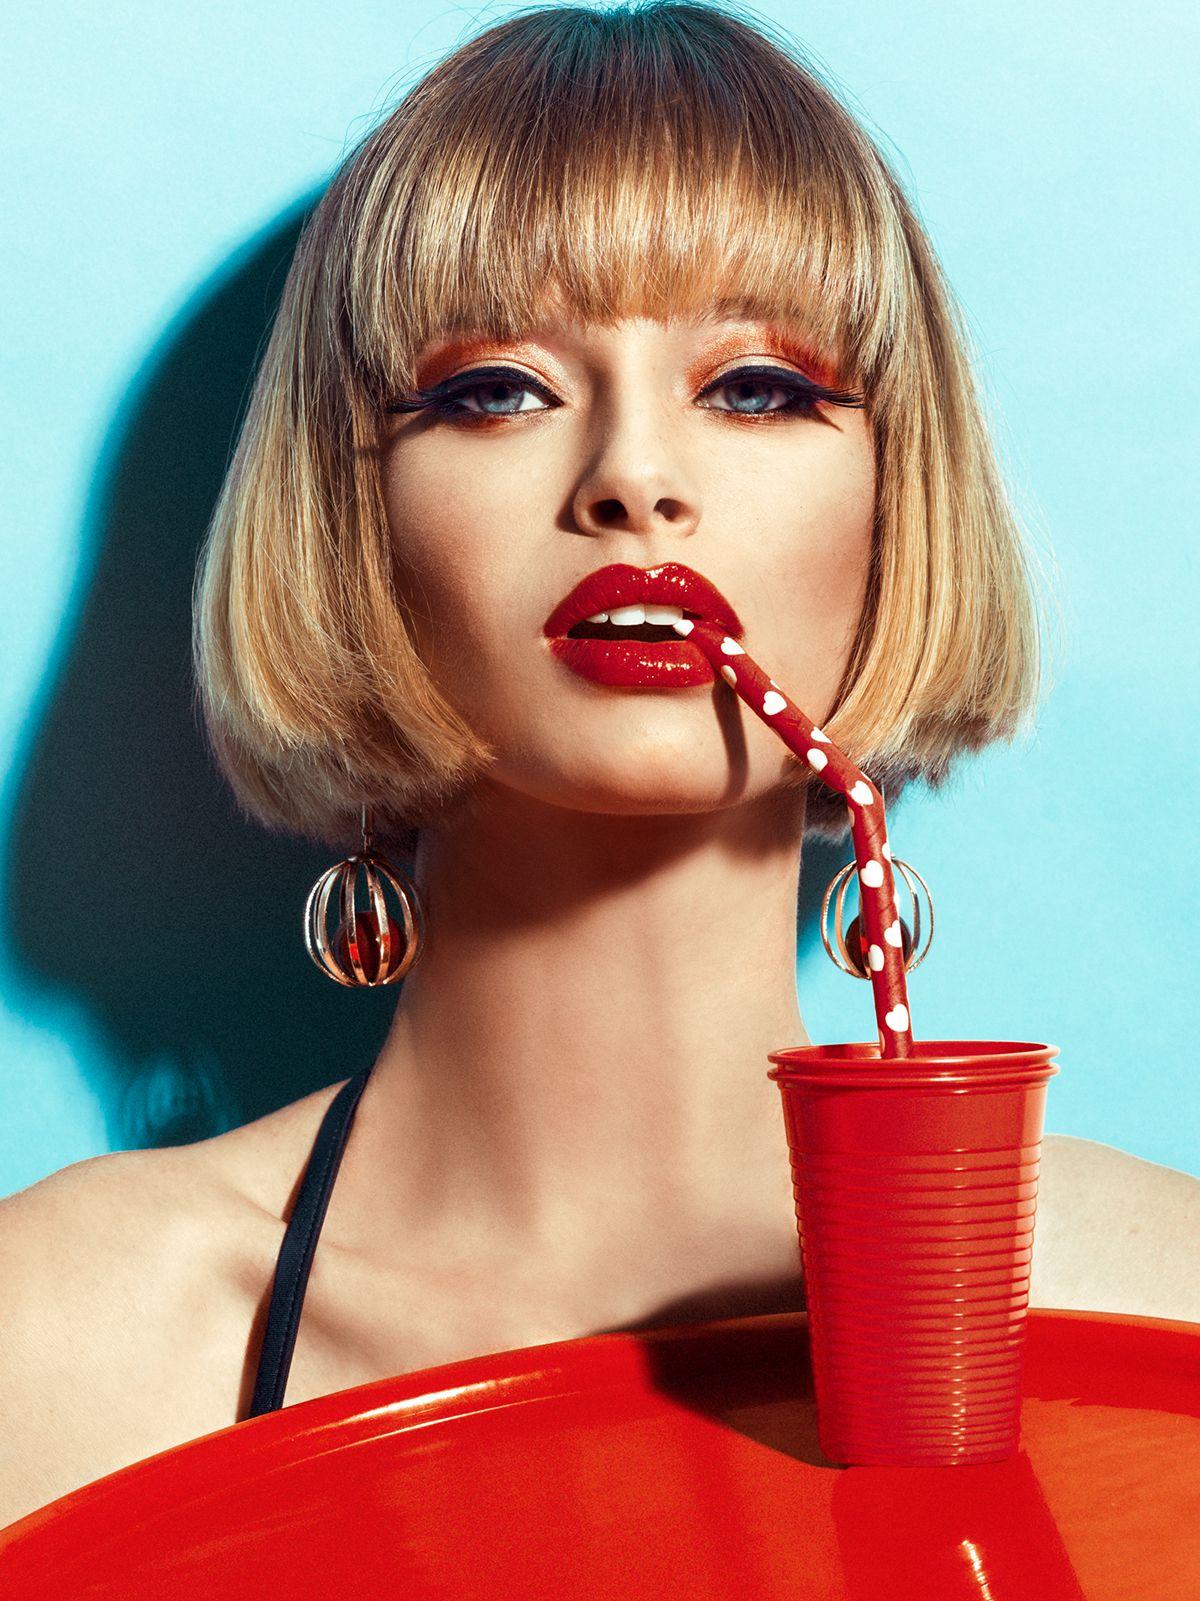 Haircut On Behance 购物app用到的素材 Pinterest Haircuts - Hairstyles app online